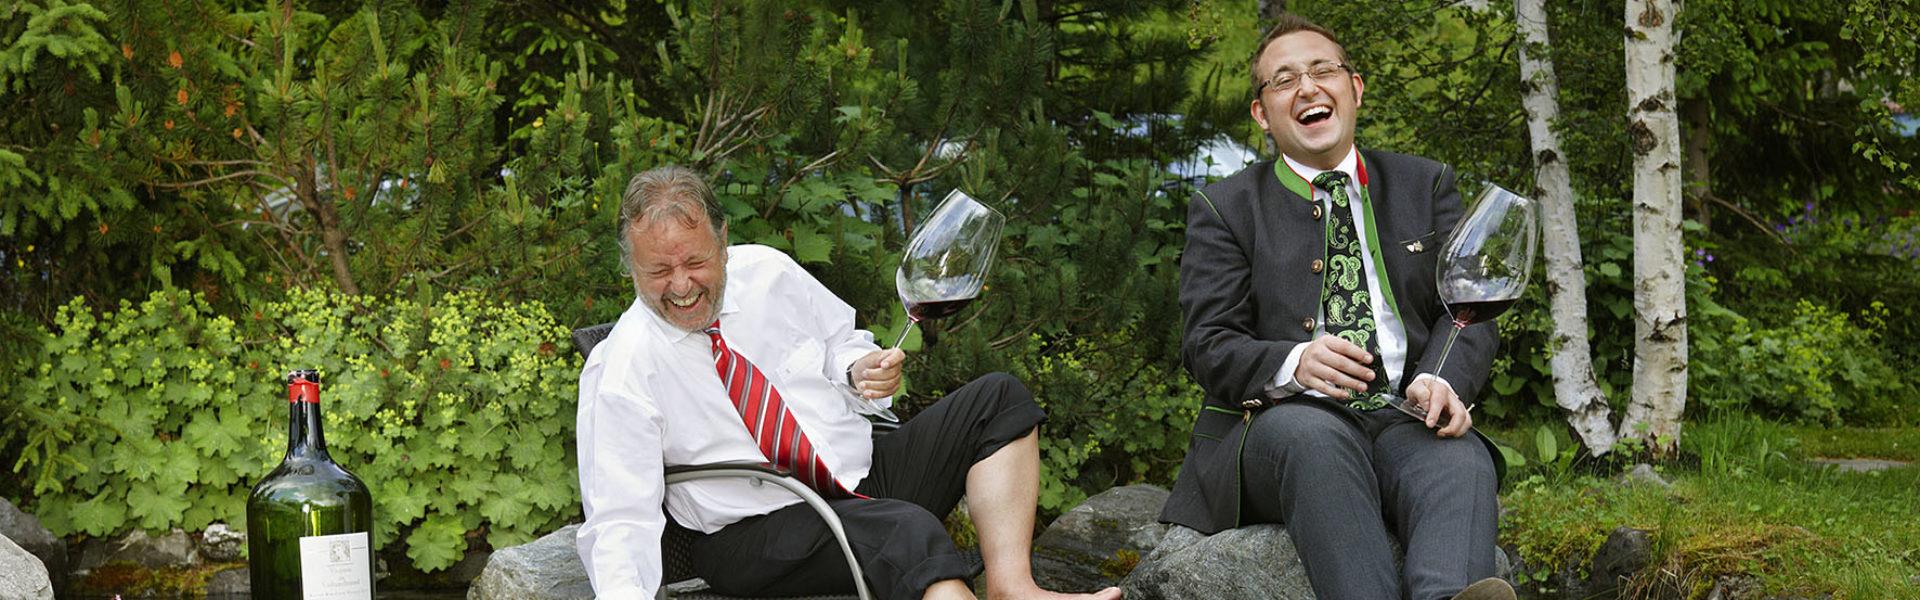 Paul und Johannes Pfefferkorn vom Golfhotel Romantik Hotel